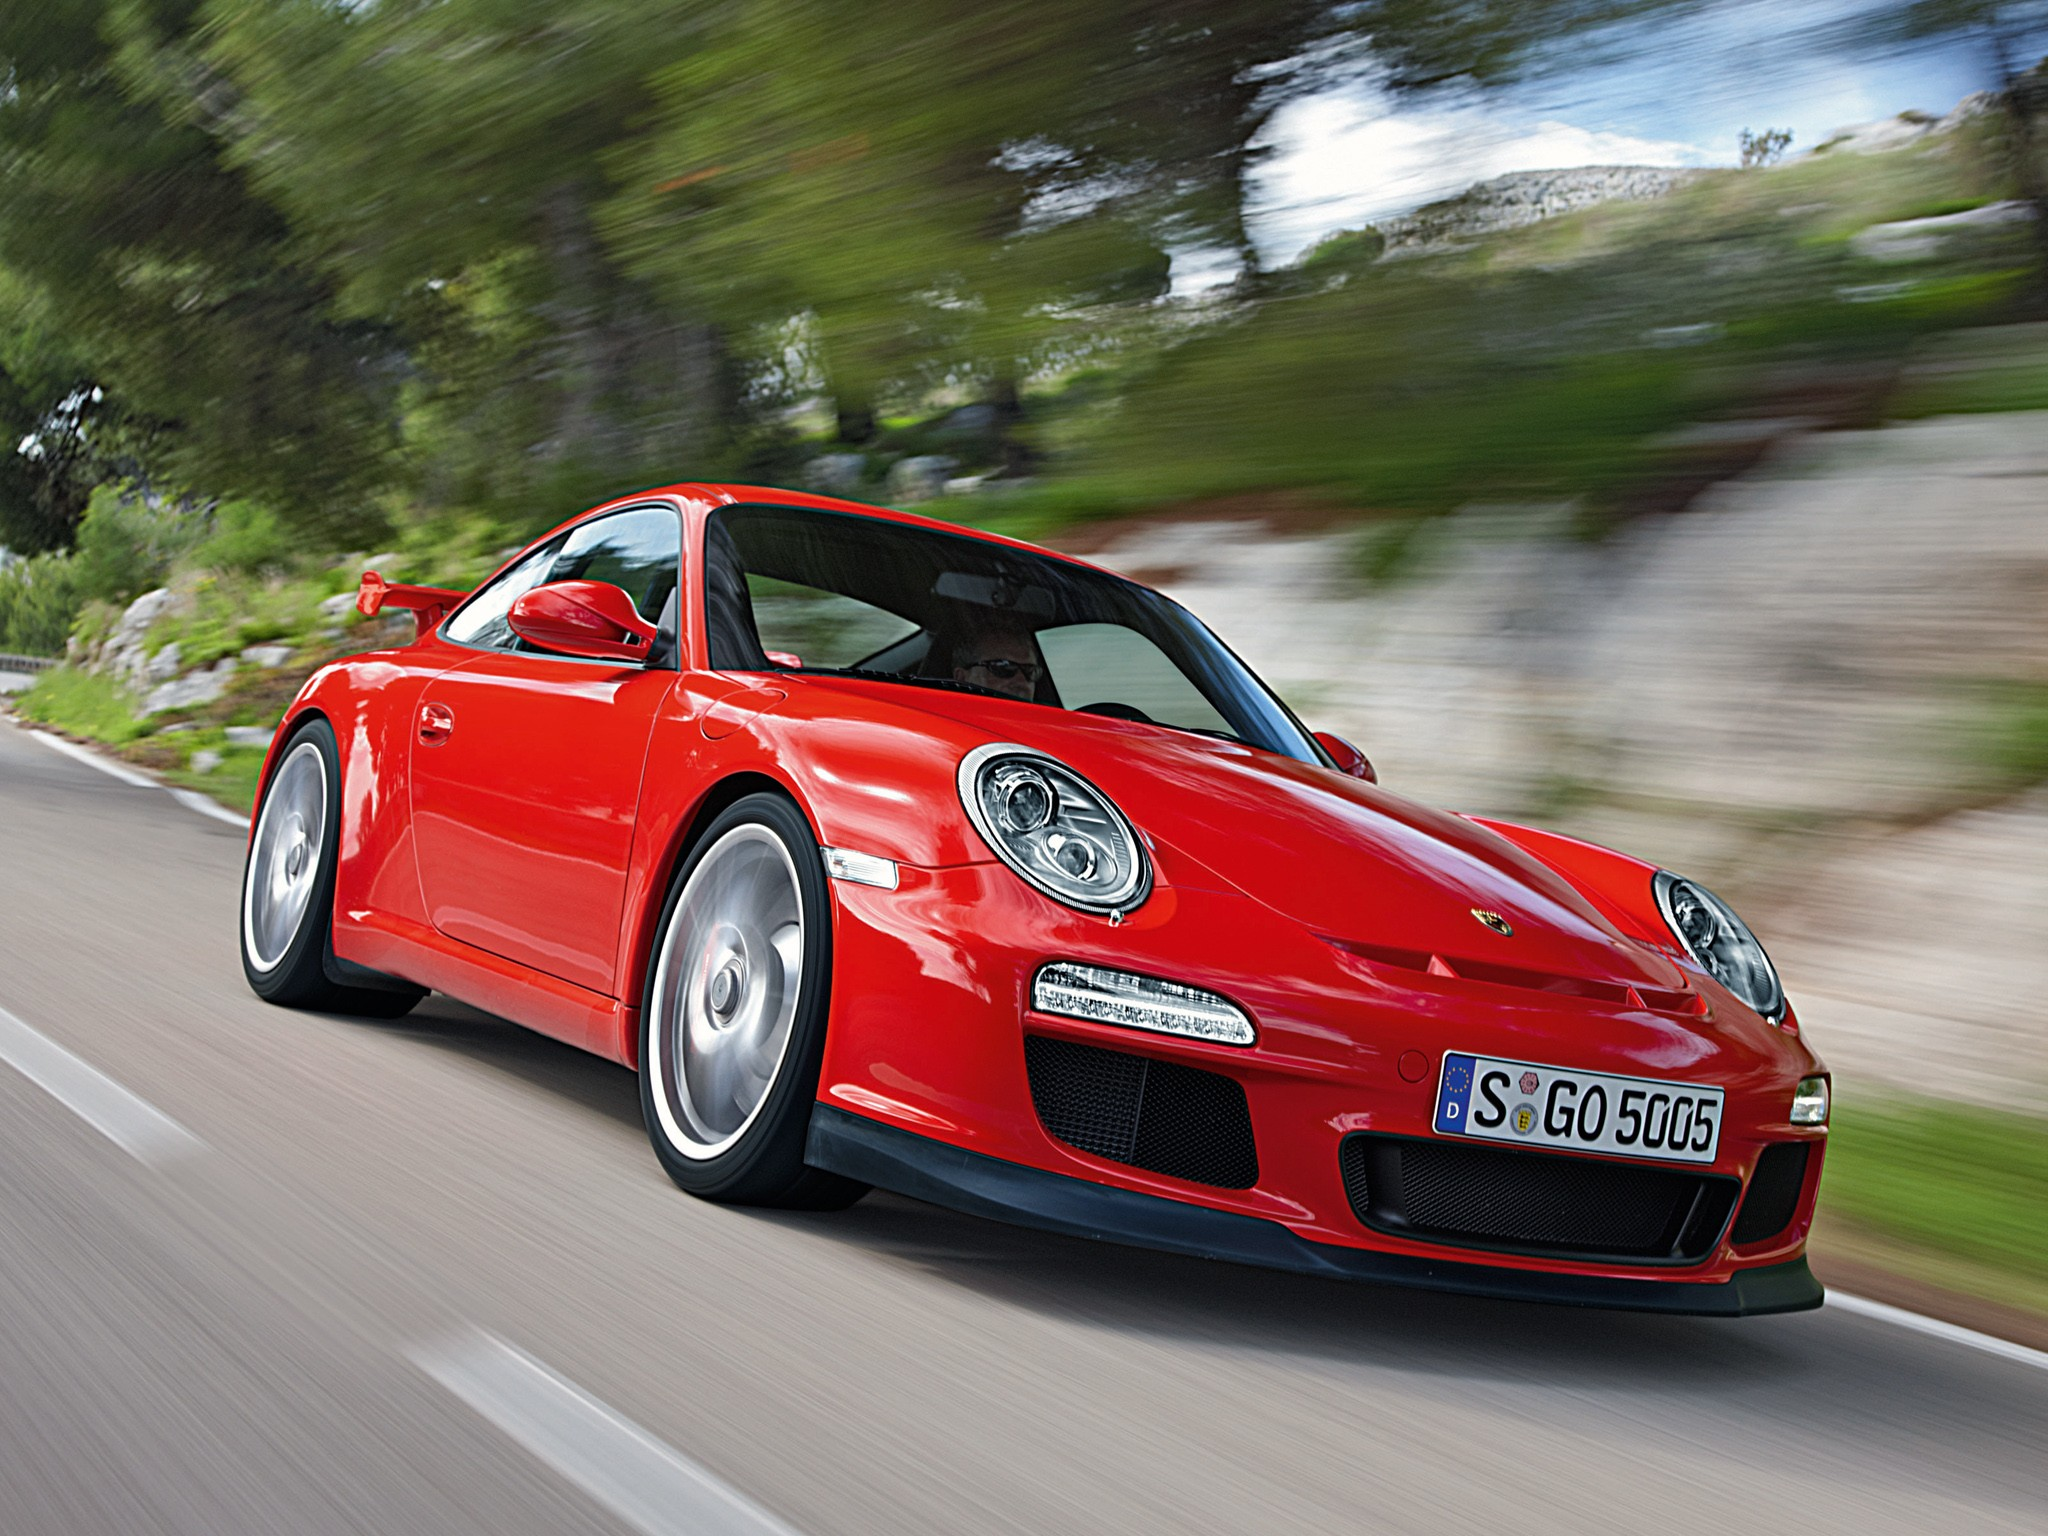 Porsche 911 Gt3 997 2009 2010 2011 Autoevolution